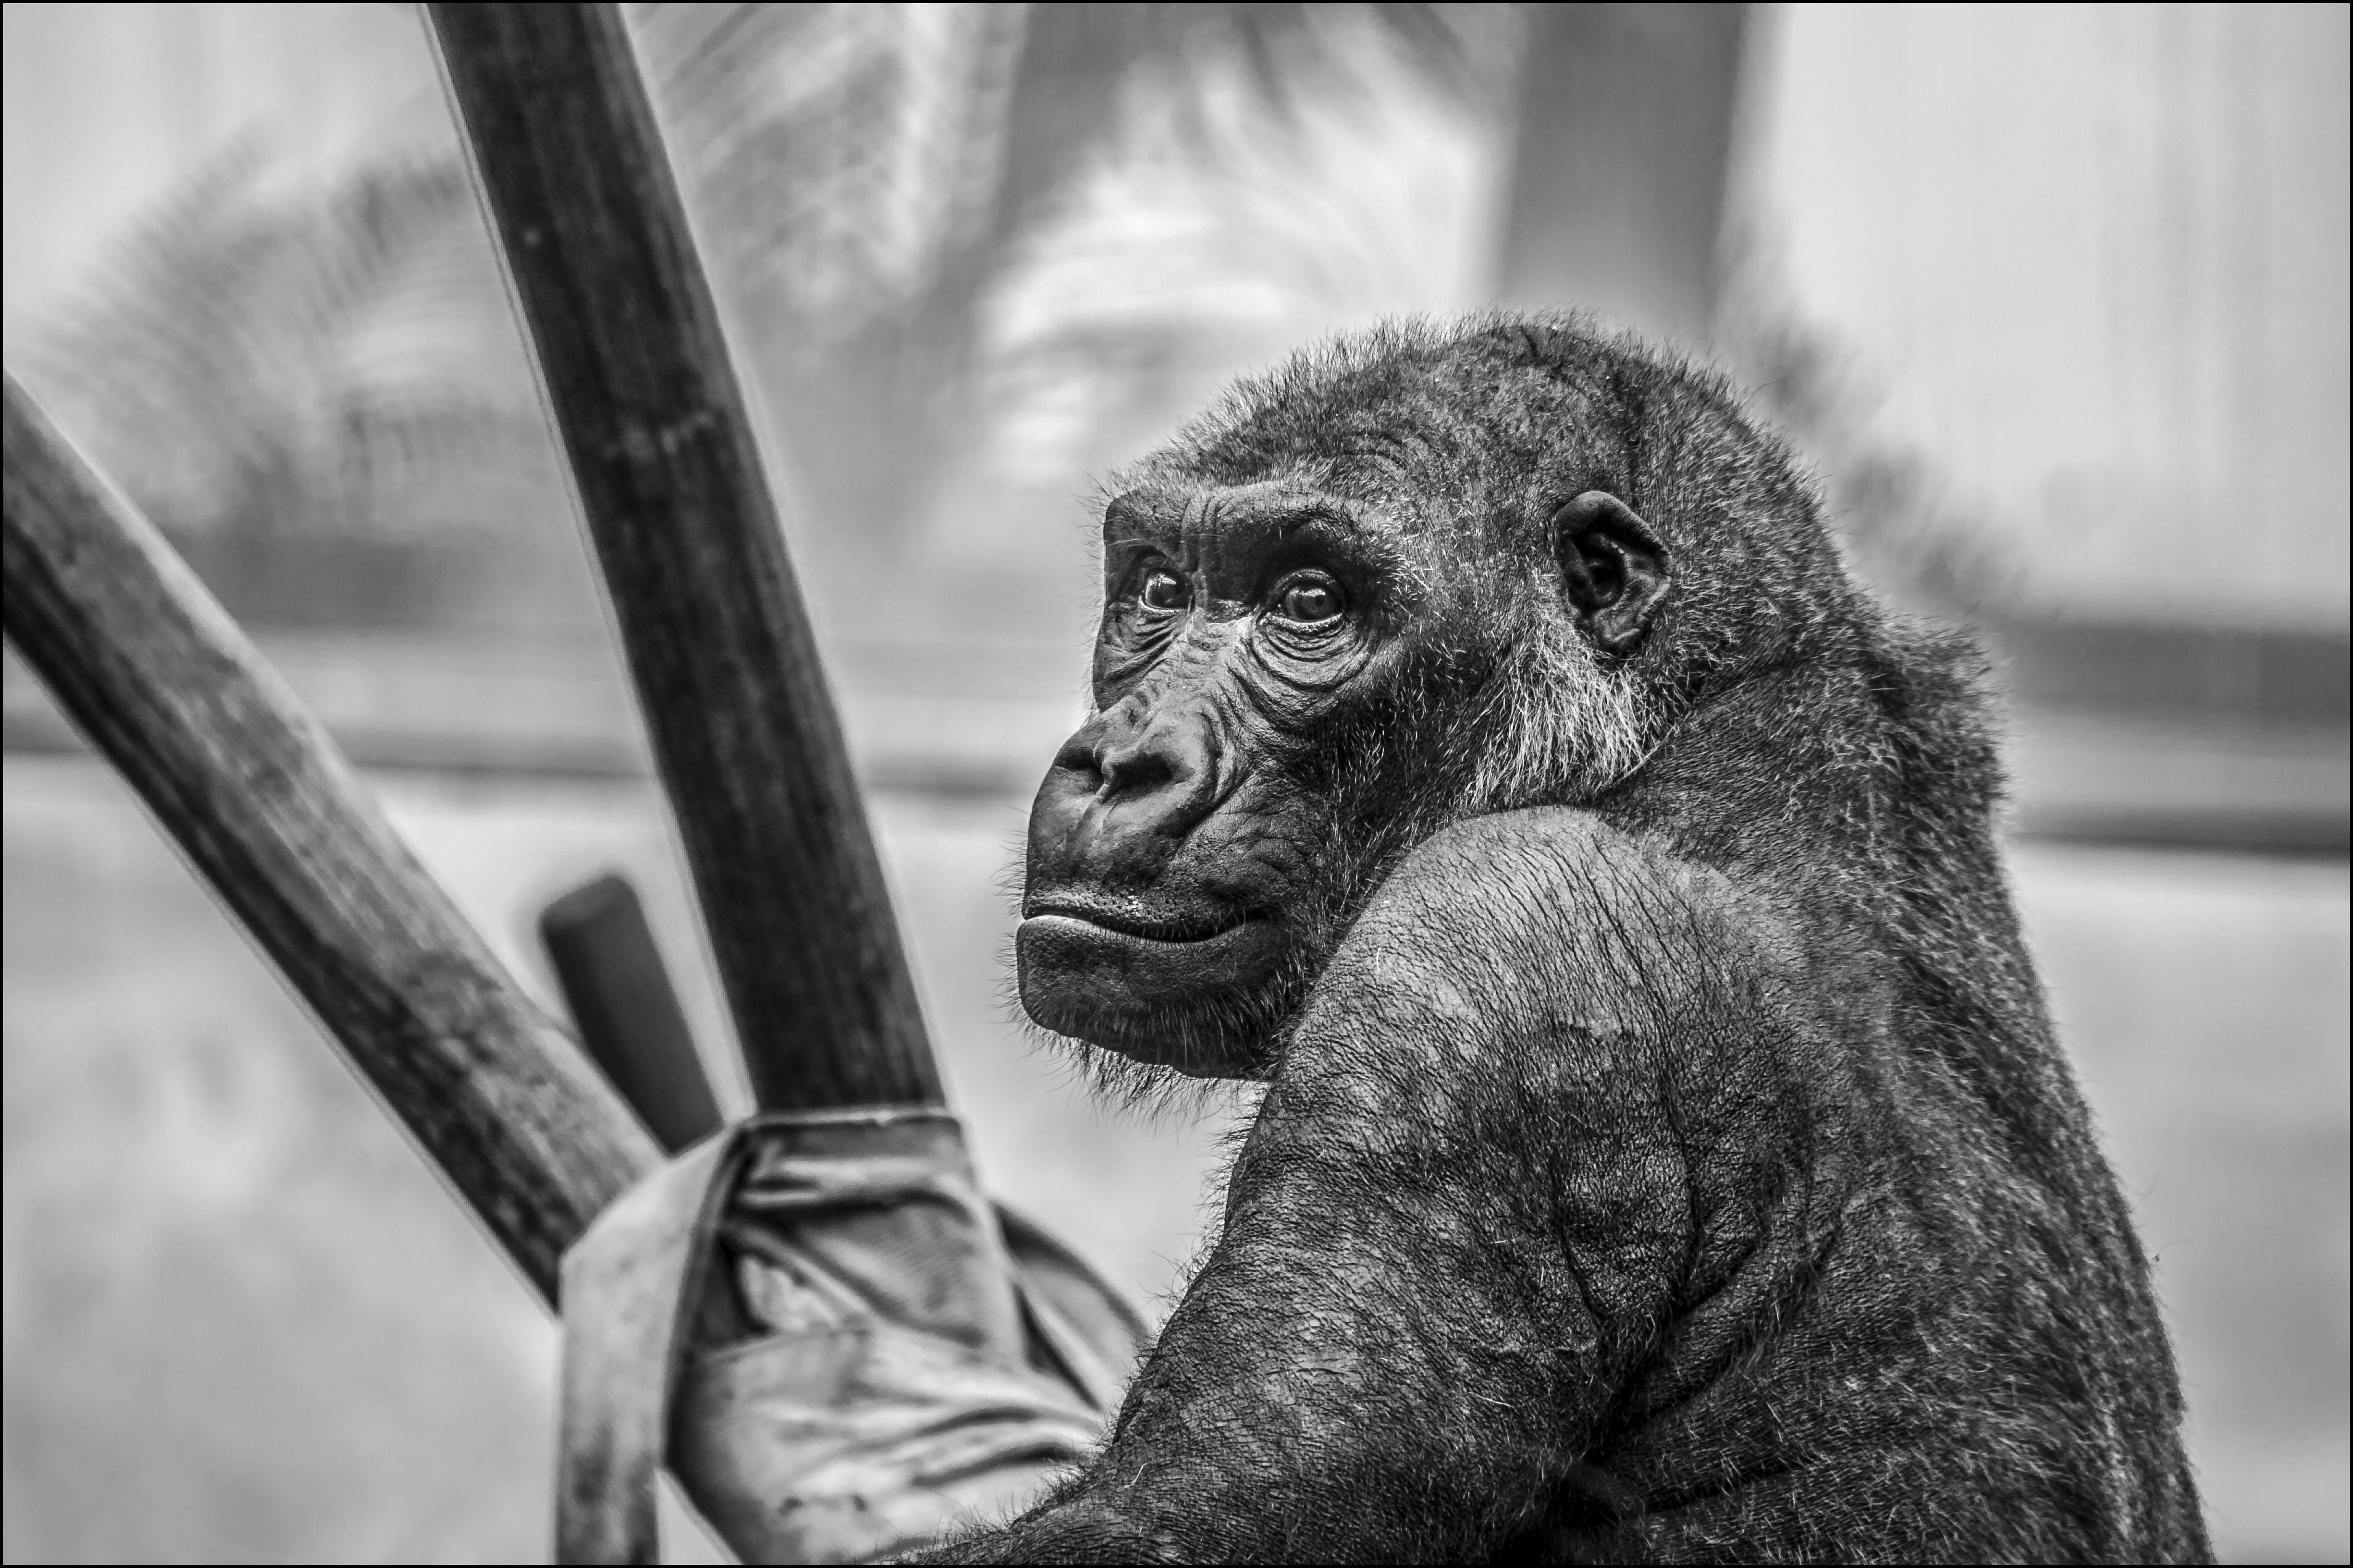 Gray Scale Photo of Black Ape